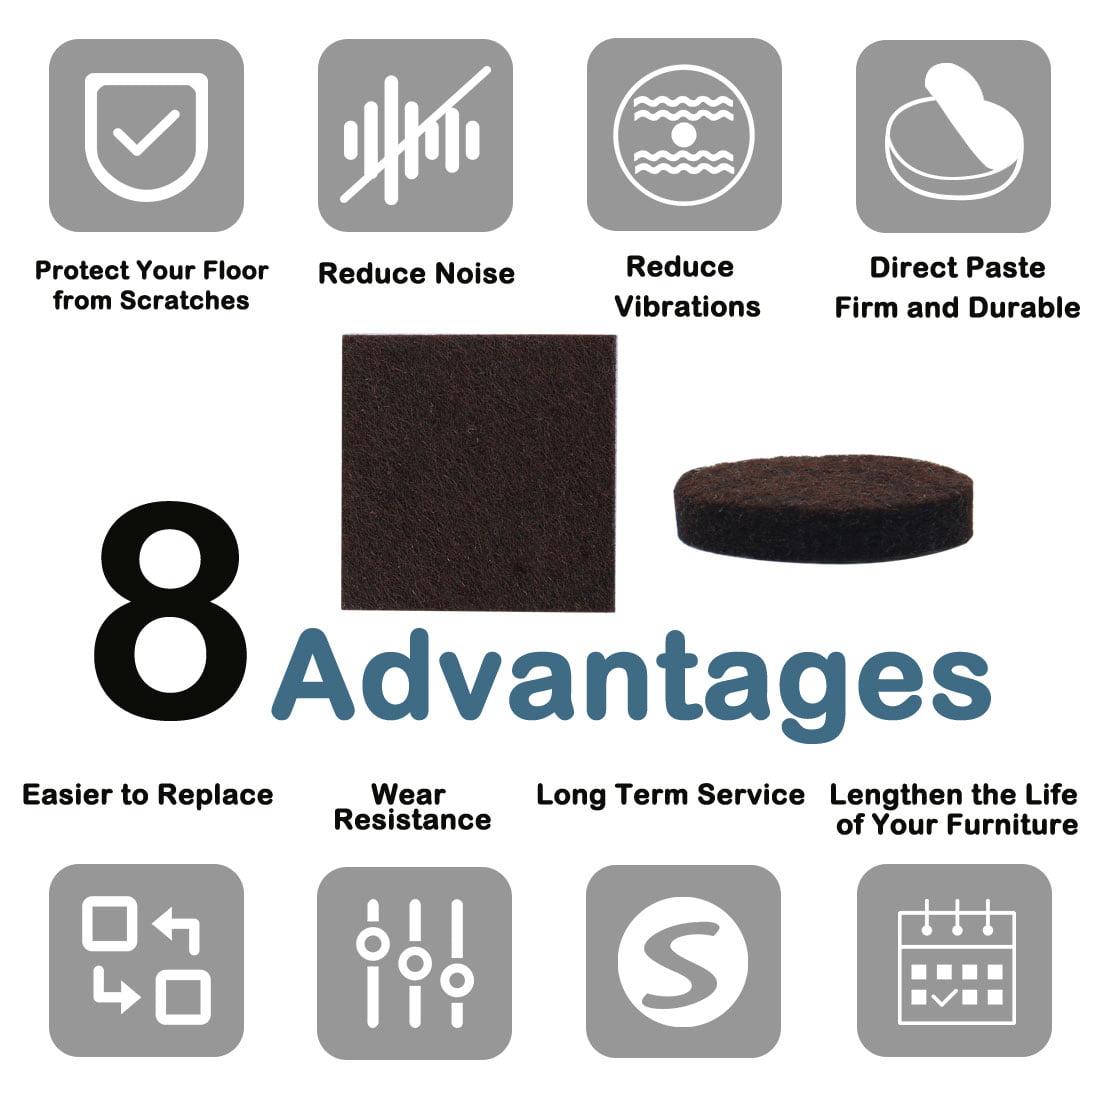 "Felt Furniture Pad Square 1 3/4"" Self Adhesive Anti-scratch Desk Protector 12pcs - image 6 of 7"